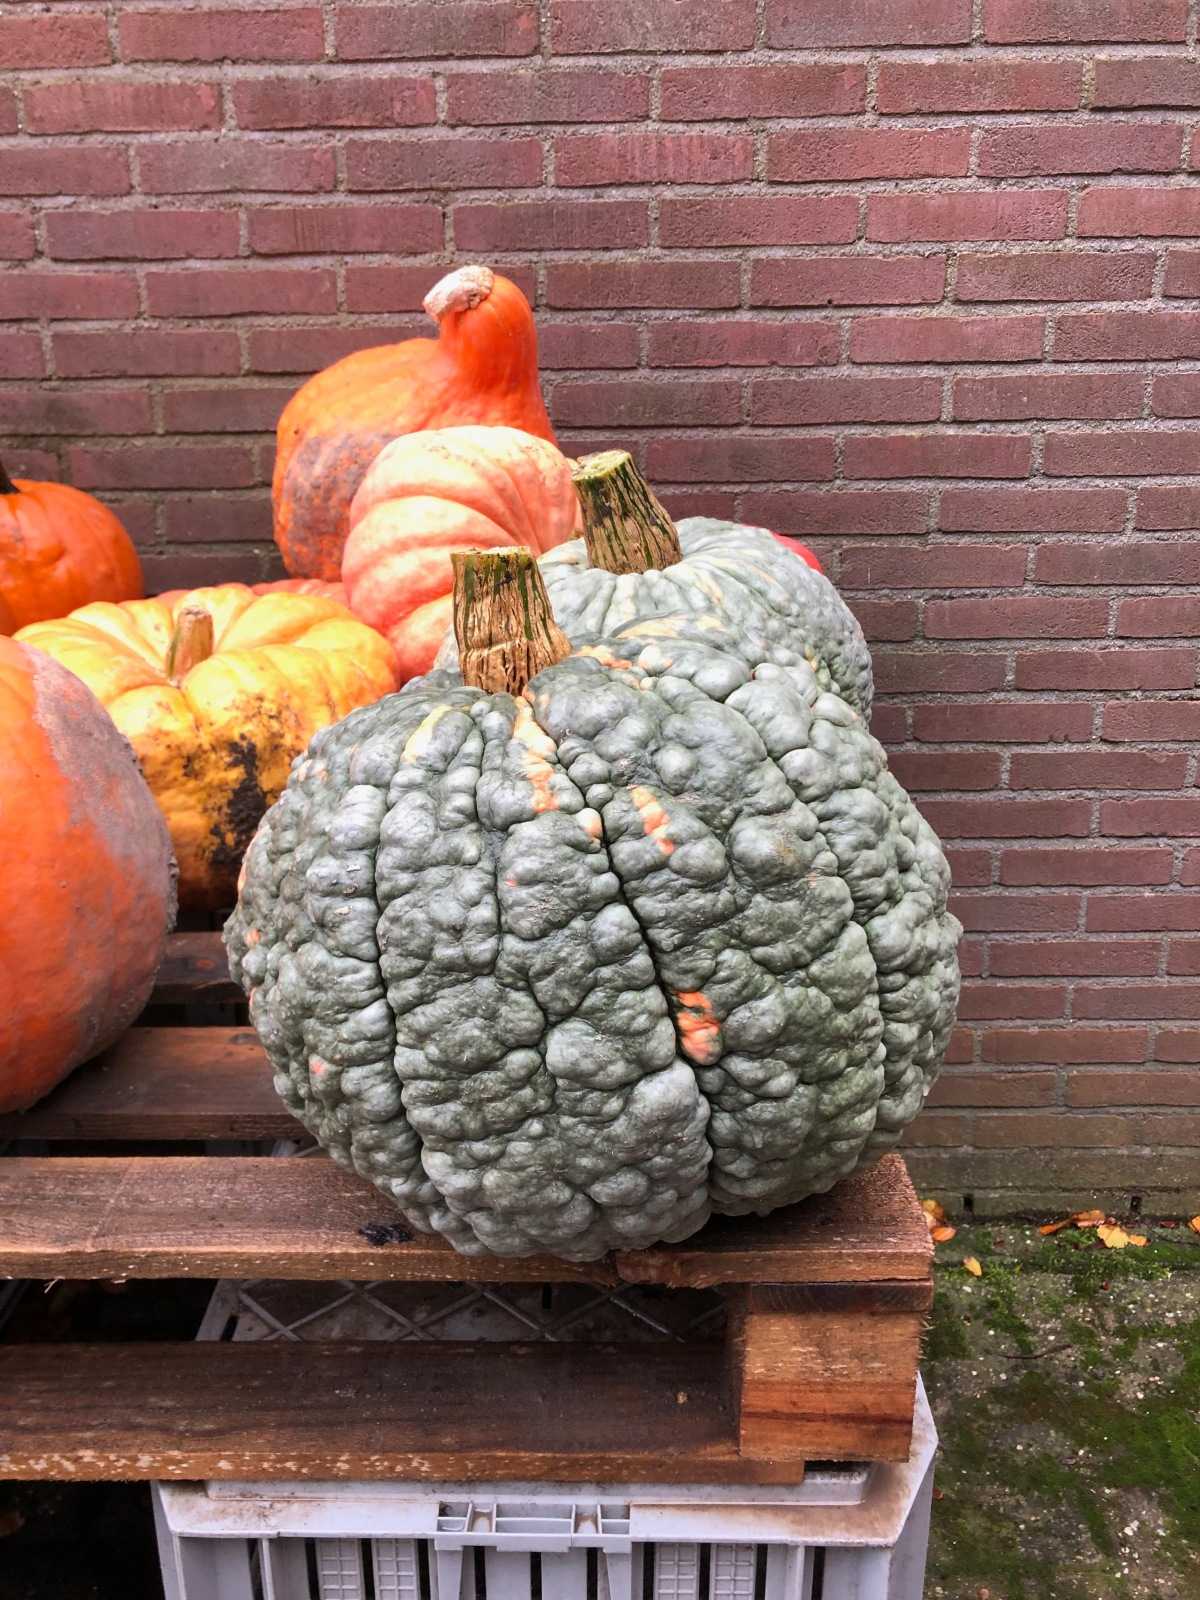 Scary pumpkins at a local Dutch pumpkin patch